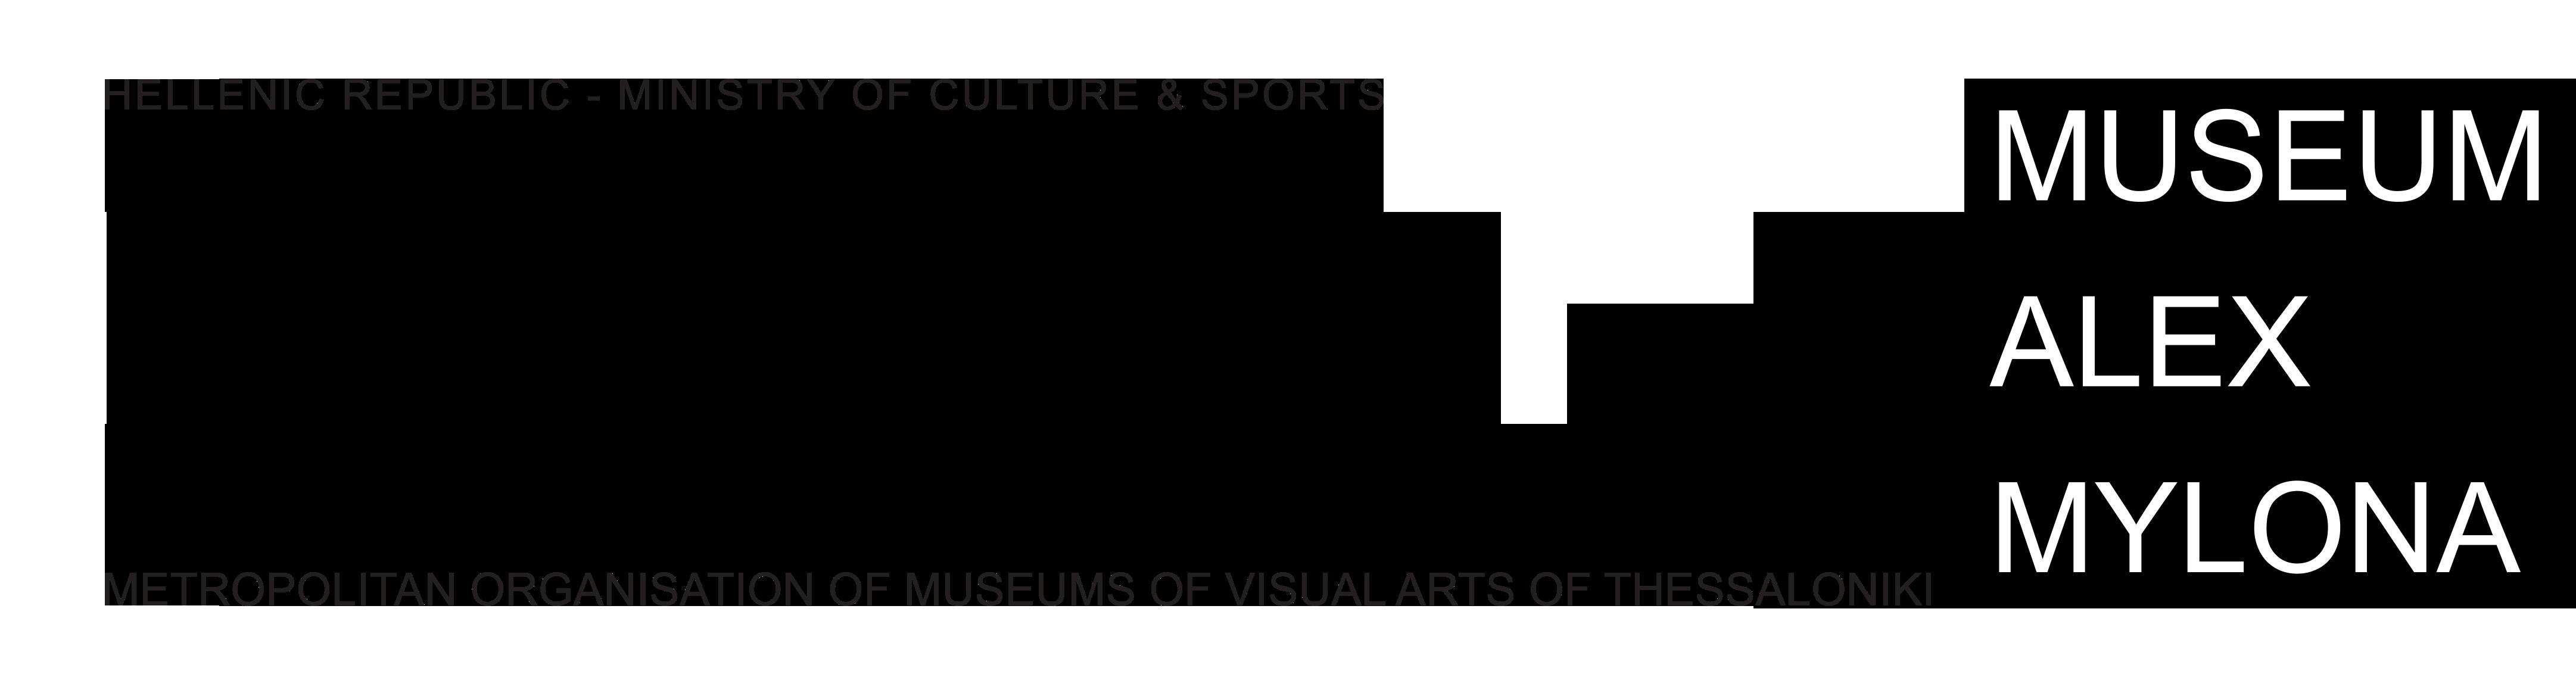 MOMus-Museum Alex Mylona